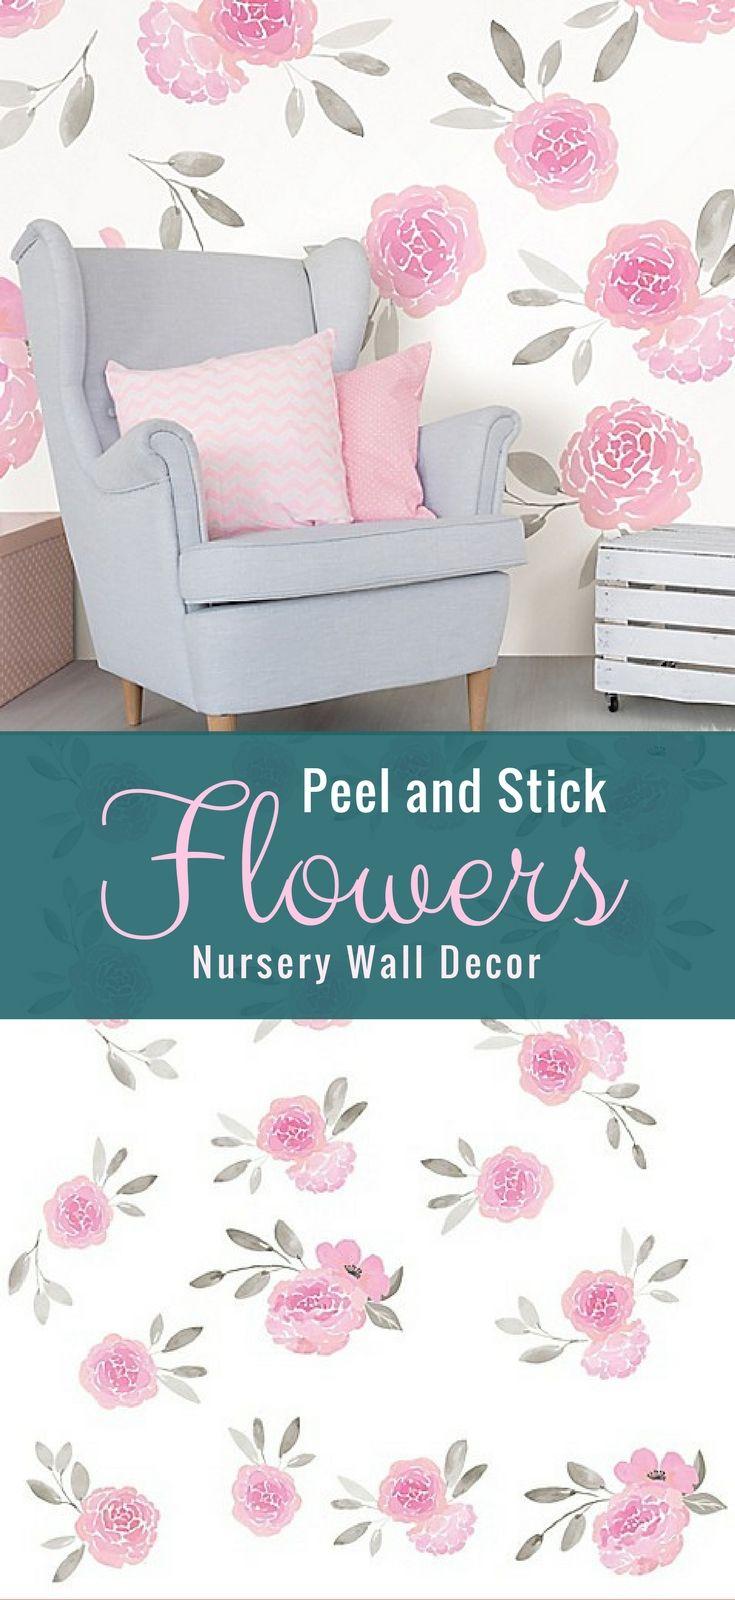 Peel and stick wall flowers for nursery baby room nursery decor